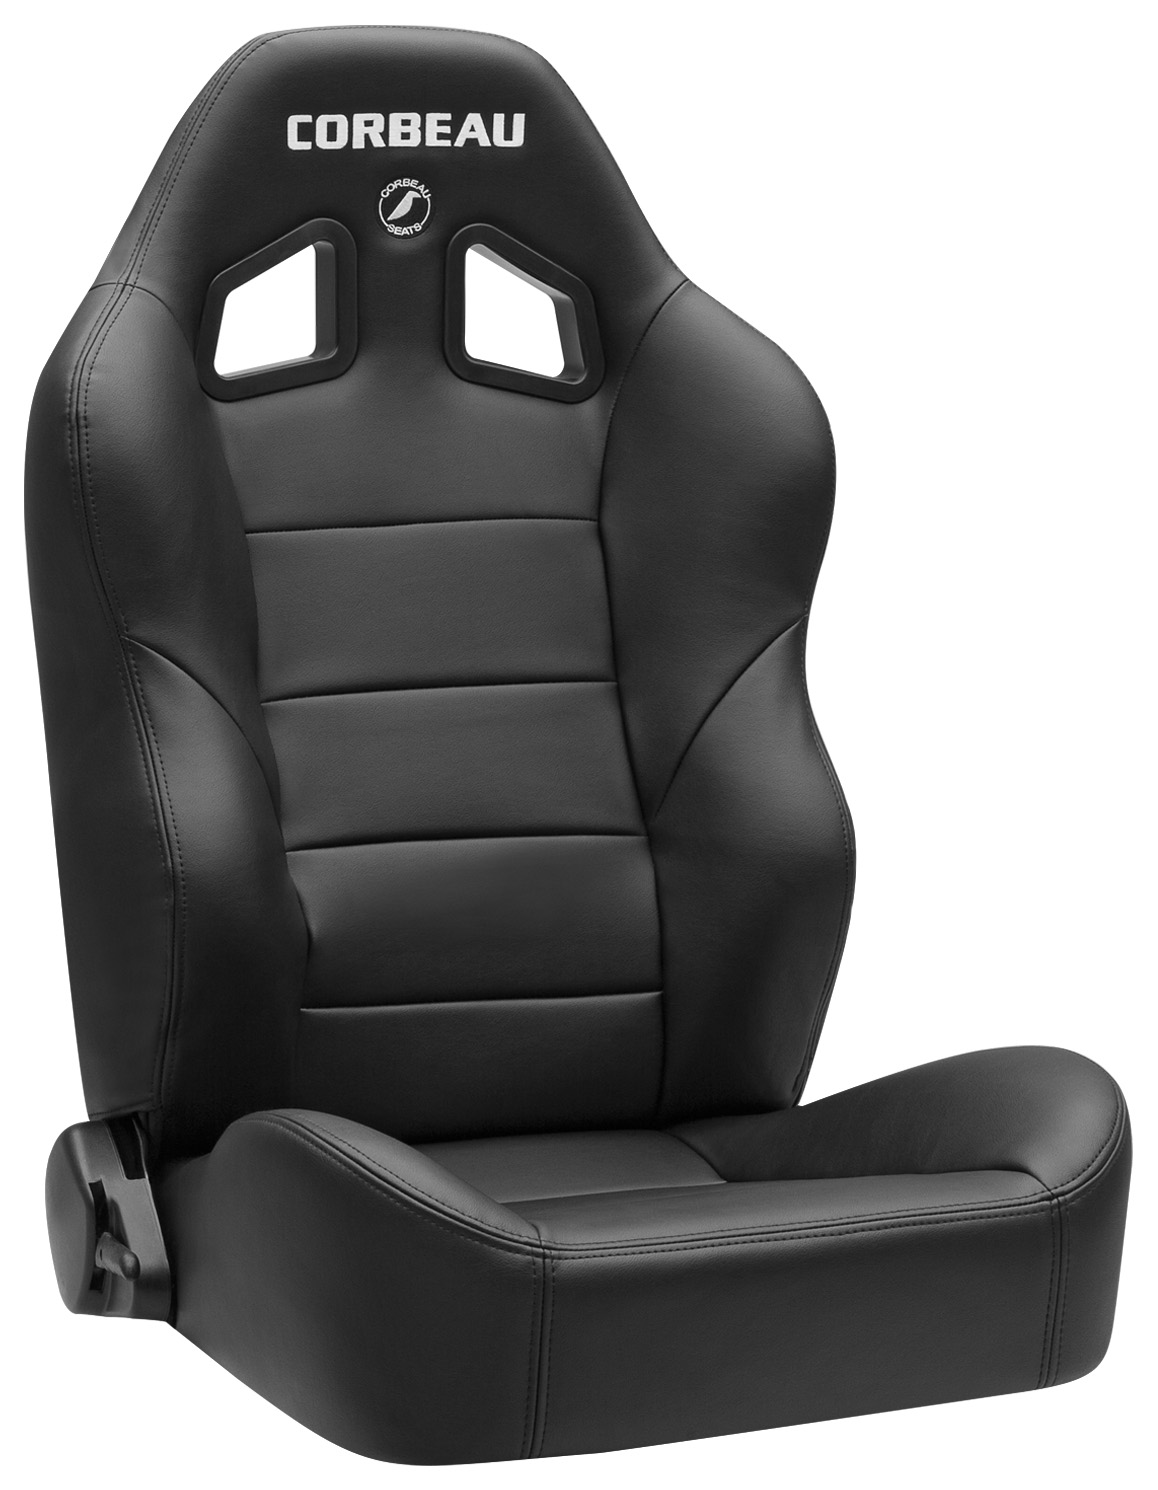 Corbeau Baja XRS Seat PAIR,Black Vinyl-Broncograveyard com